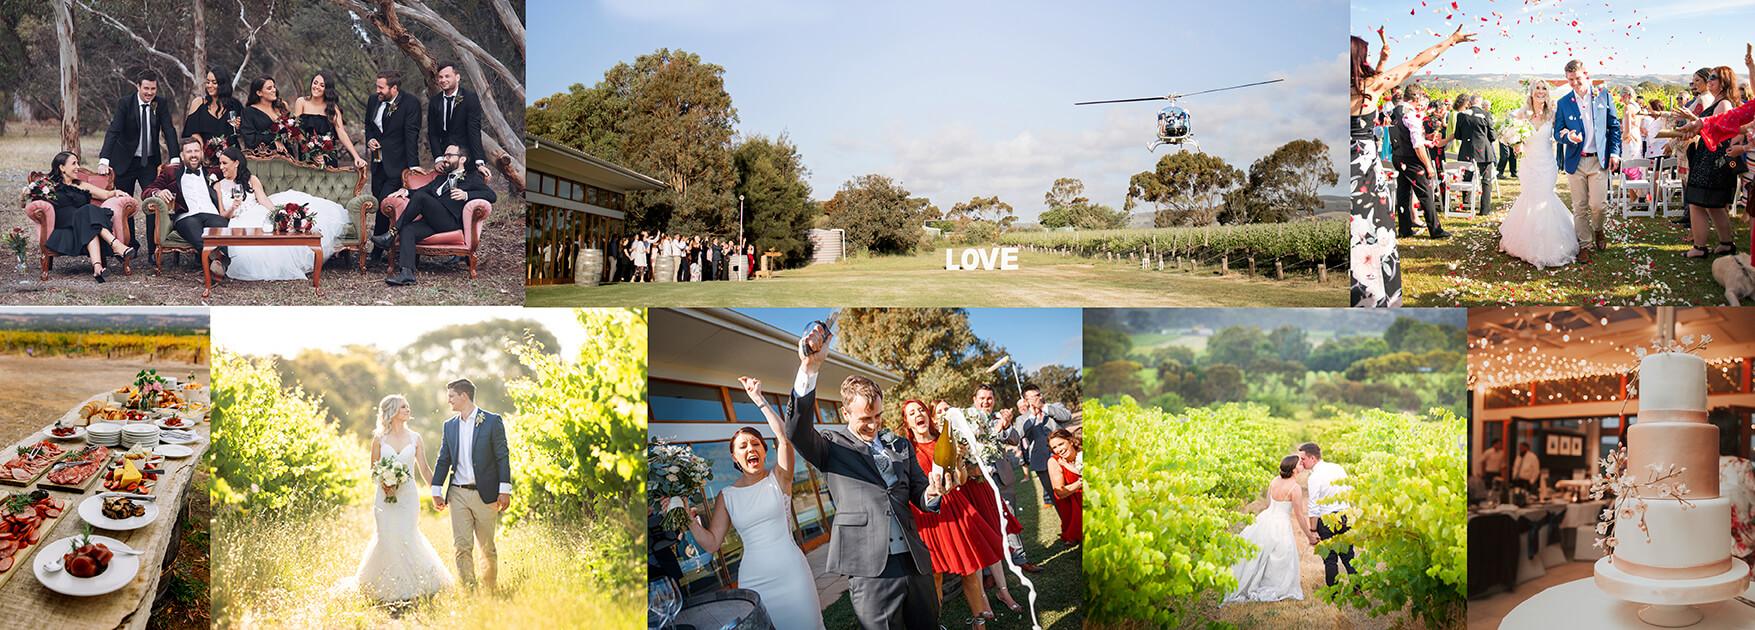 McLaren Vale Wedding Venue - Ekhidna Wines